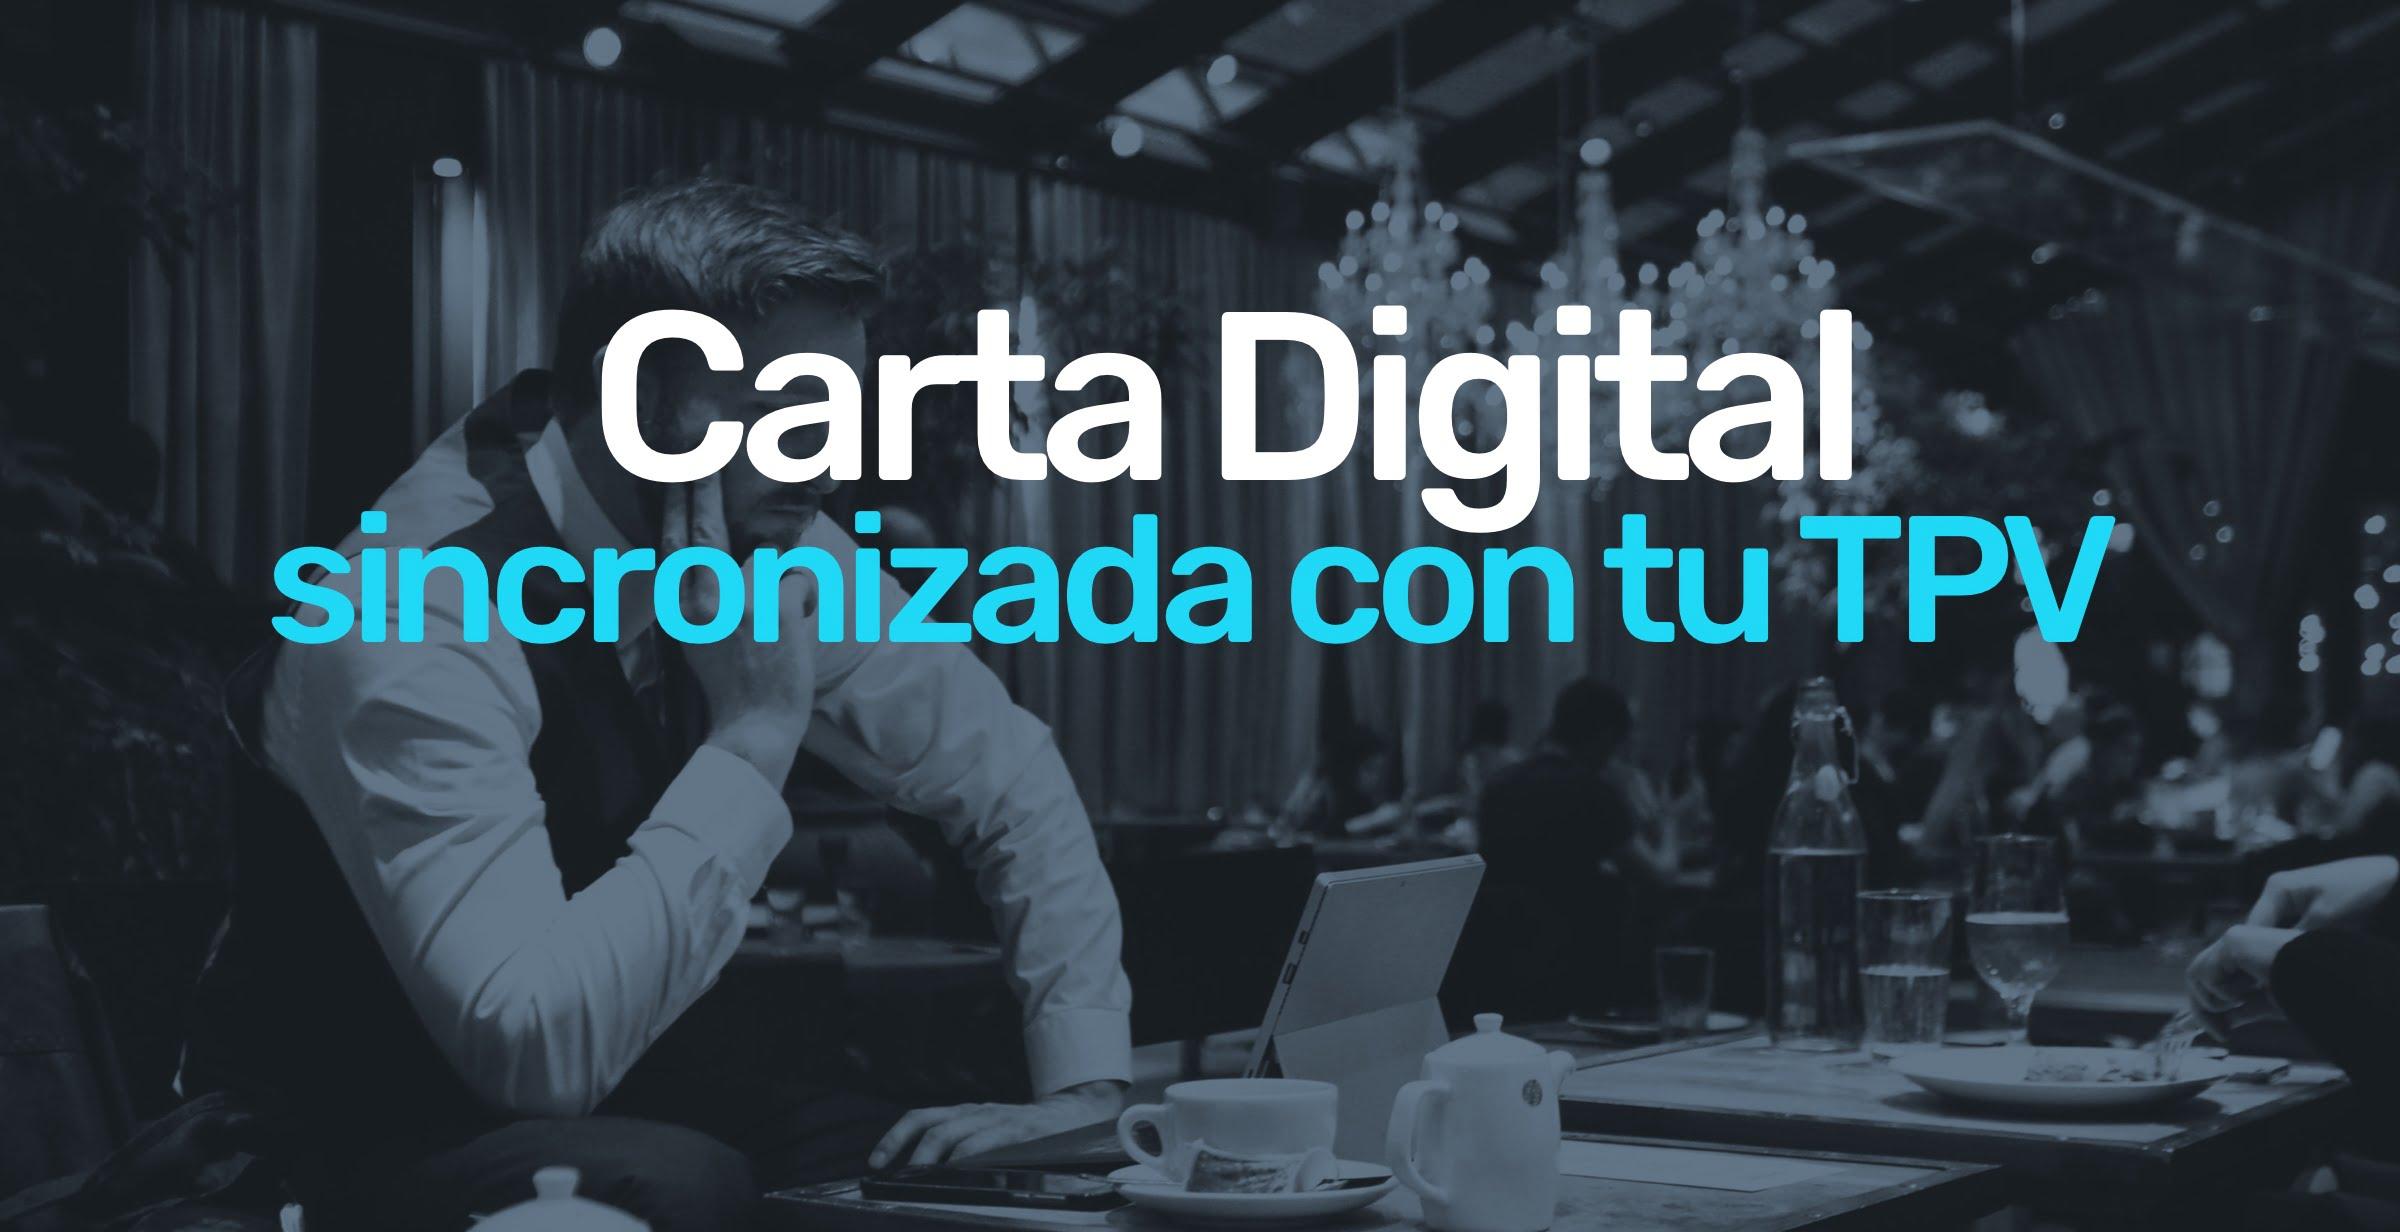 carta-digital-restaurante-sincronizada